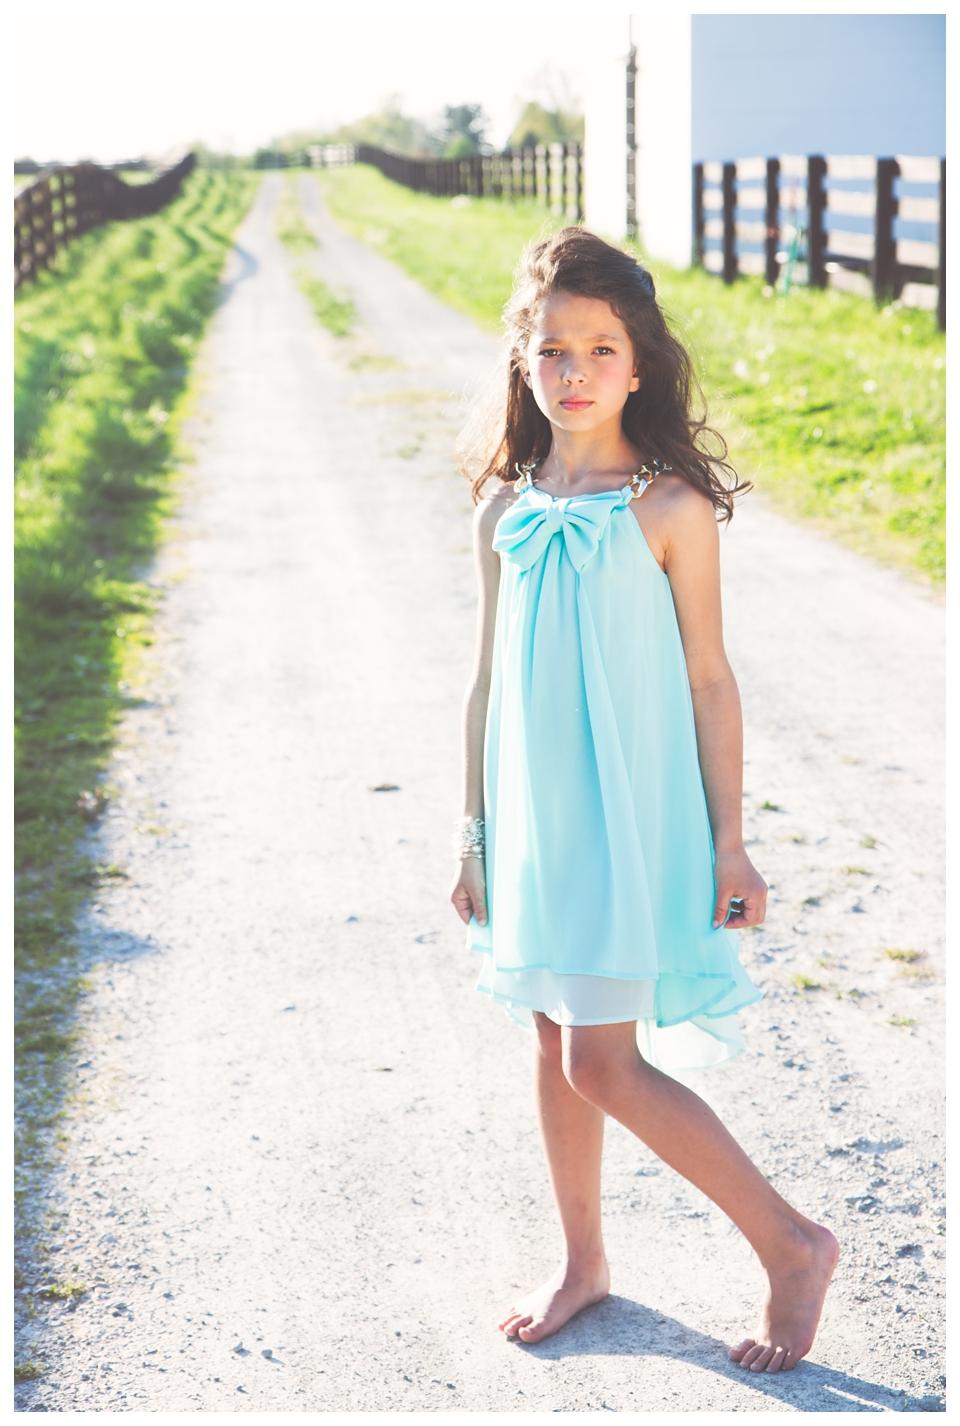 Child Headshots and Modeling Photos - Break Into Acting in Atlanta